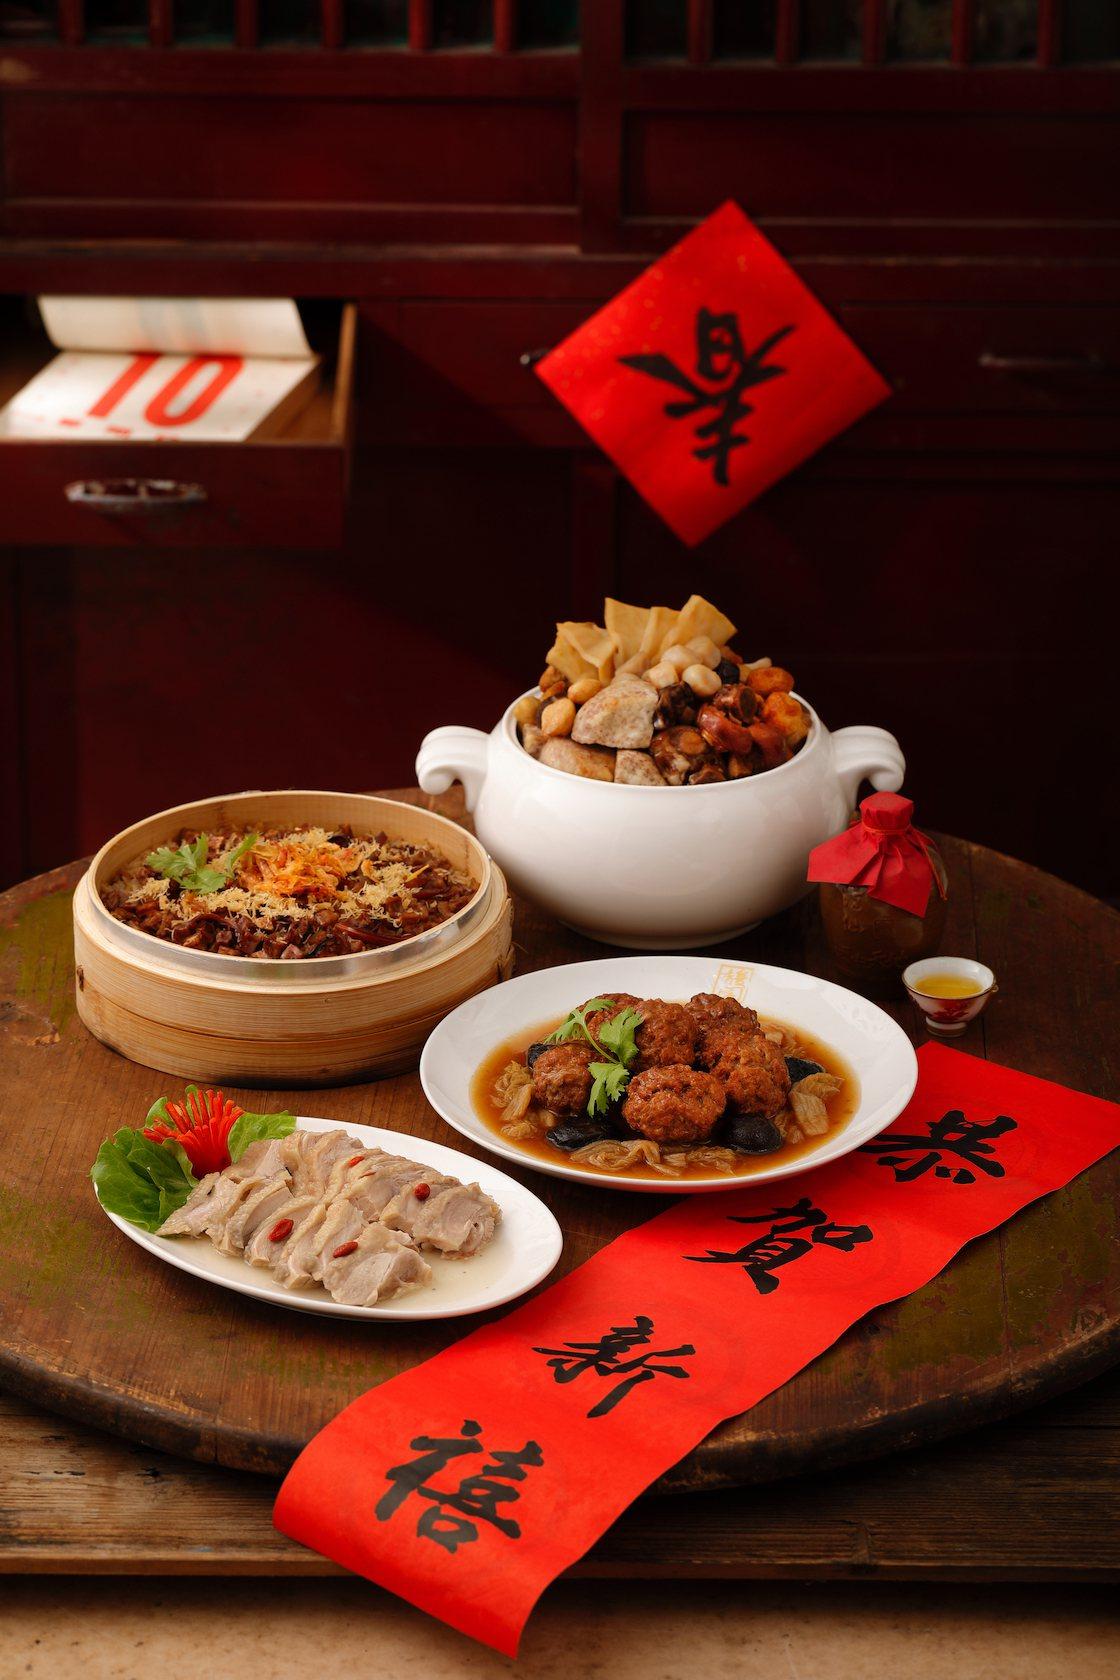 A組有珍品佛跳牆、干貝櫻花蝦油飯等佳餚,每套2,388元。